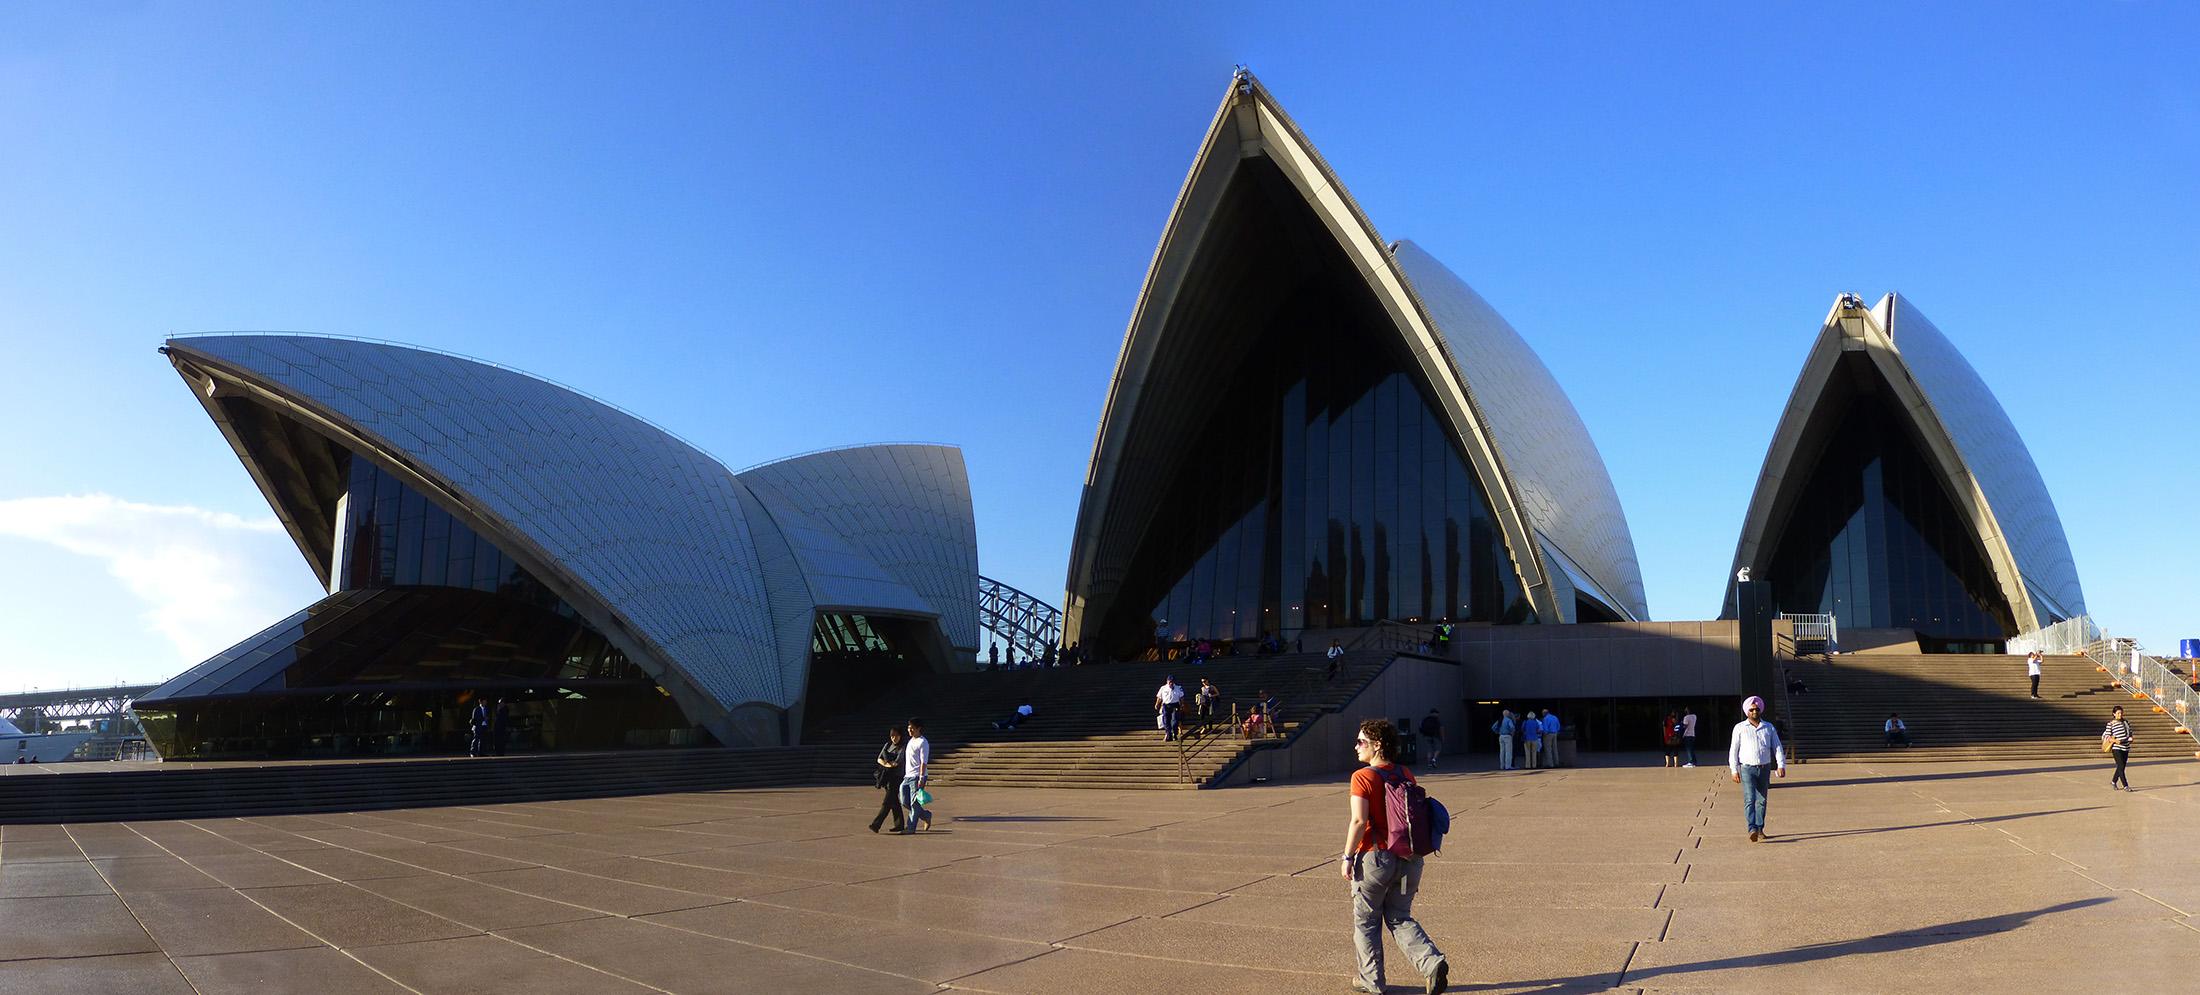 Approaching The Opera House